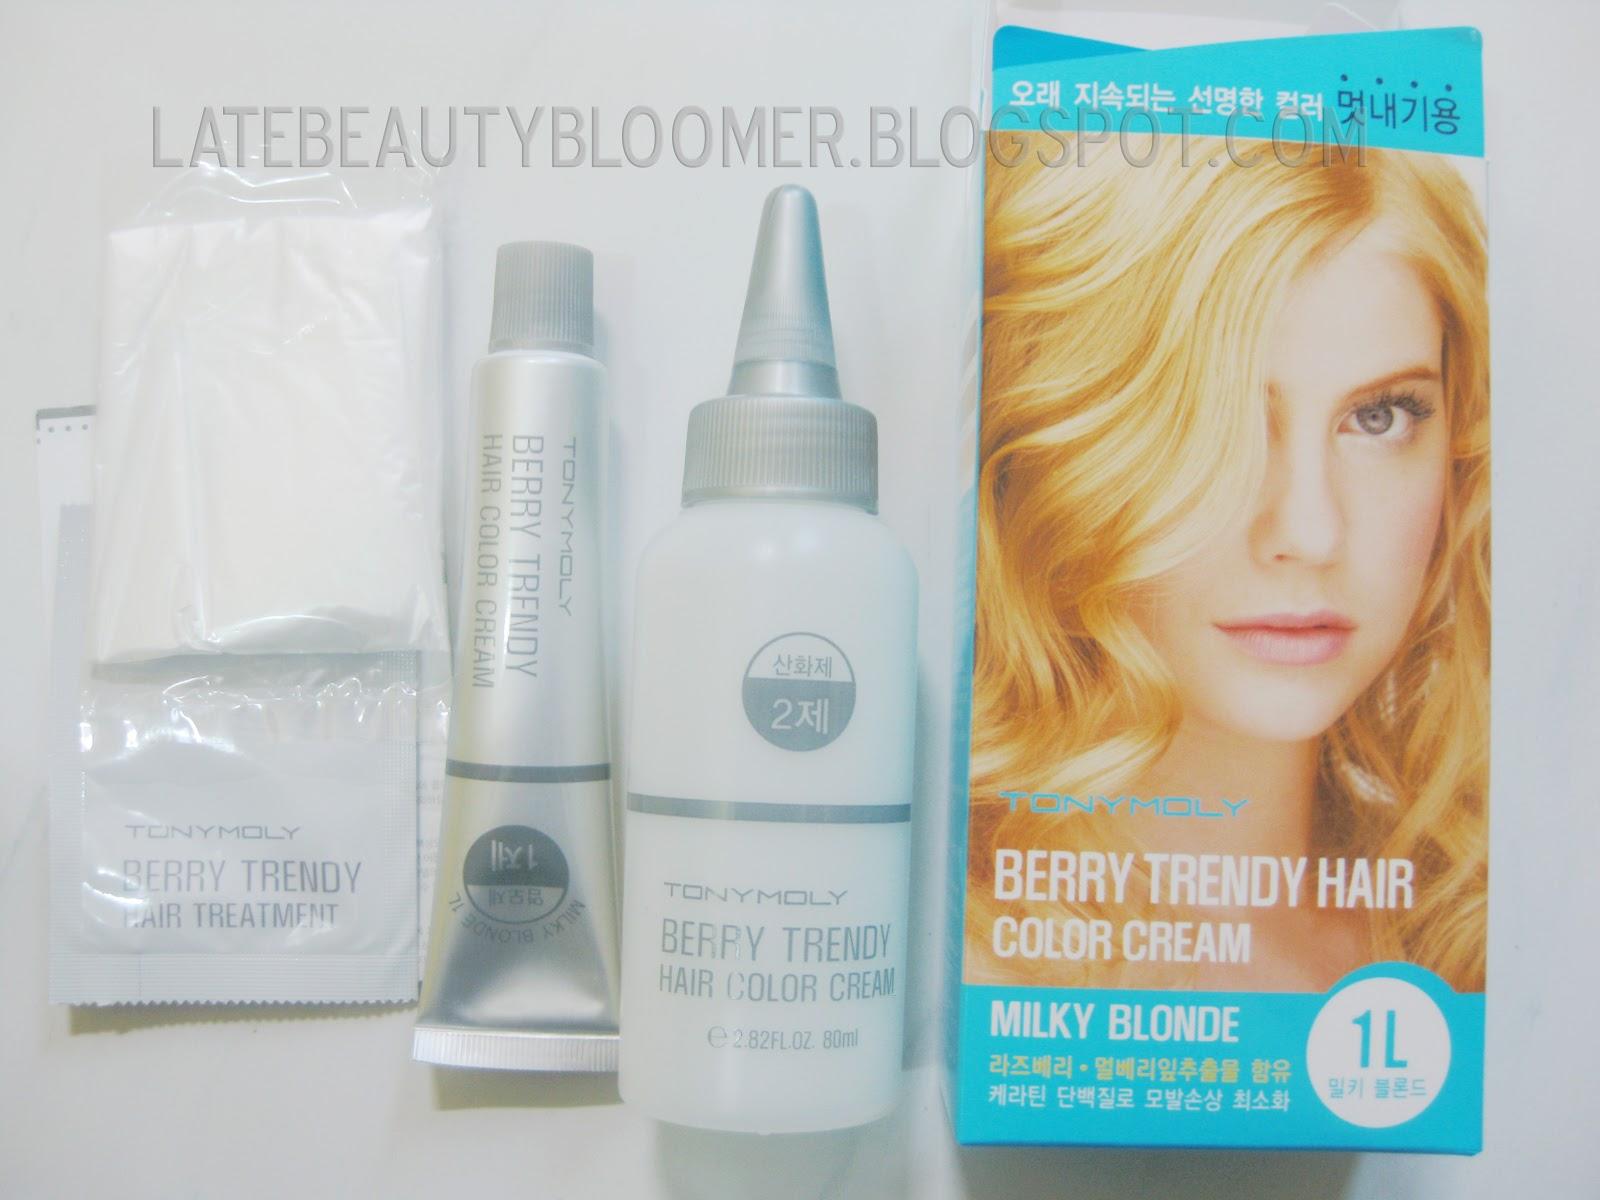 Shays Lifestyle Diary Tony Moly Berry Trendy Hair Color Cream